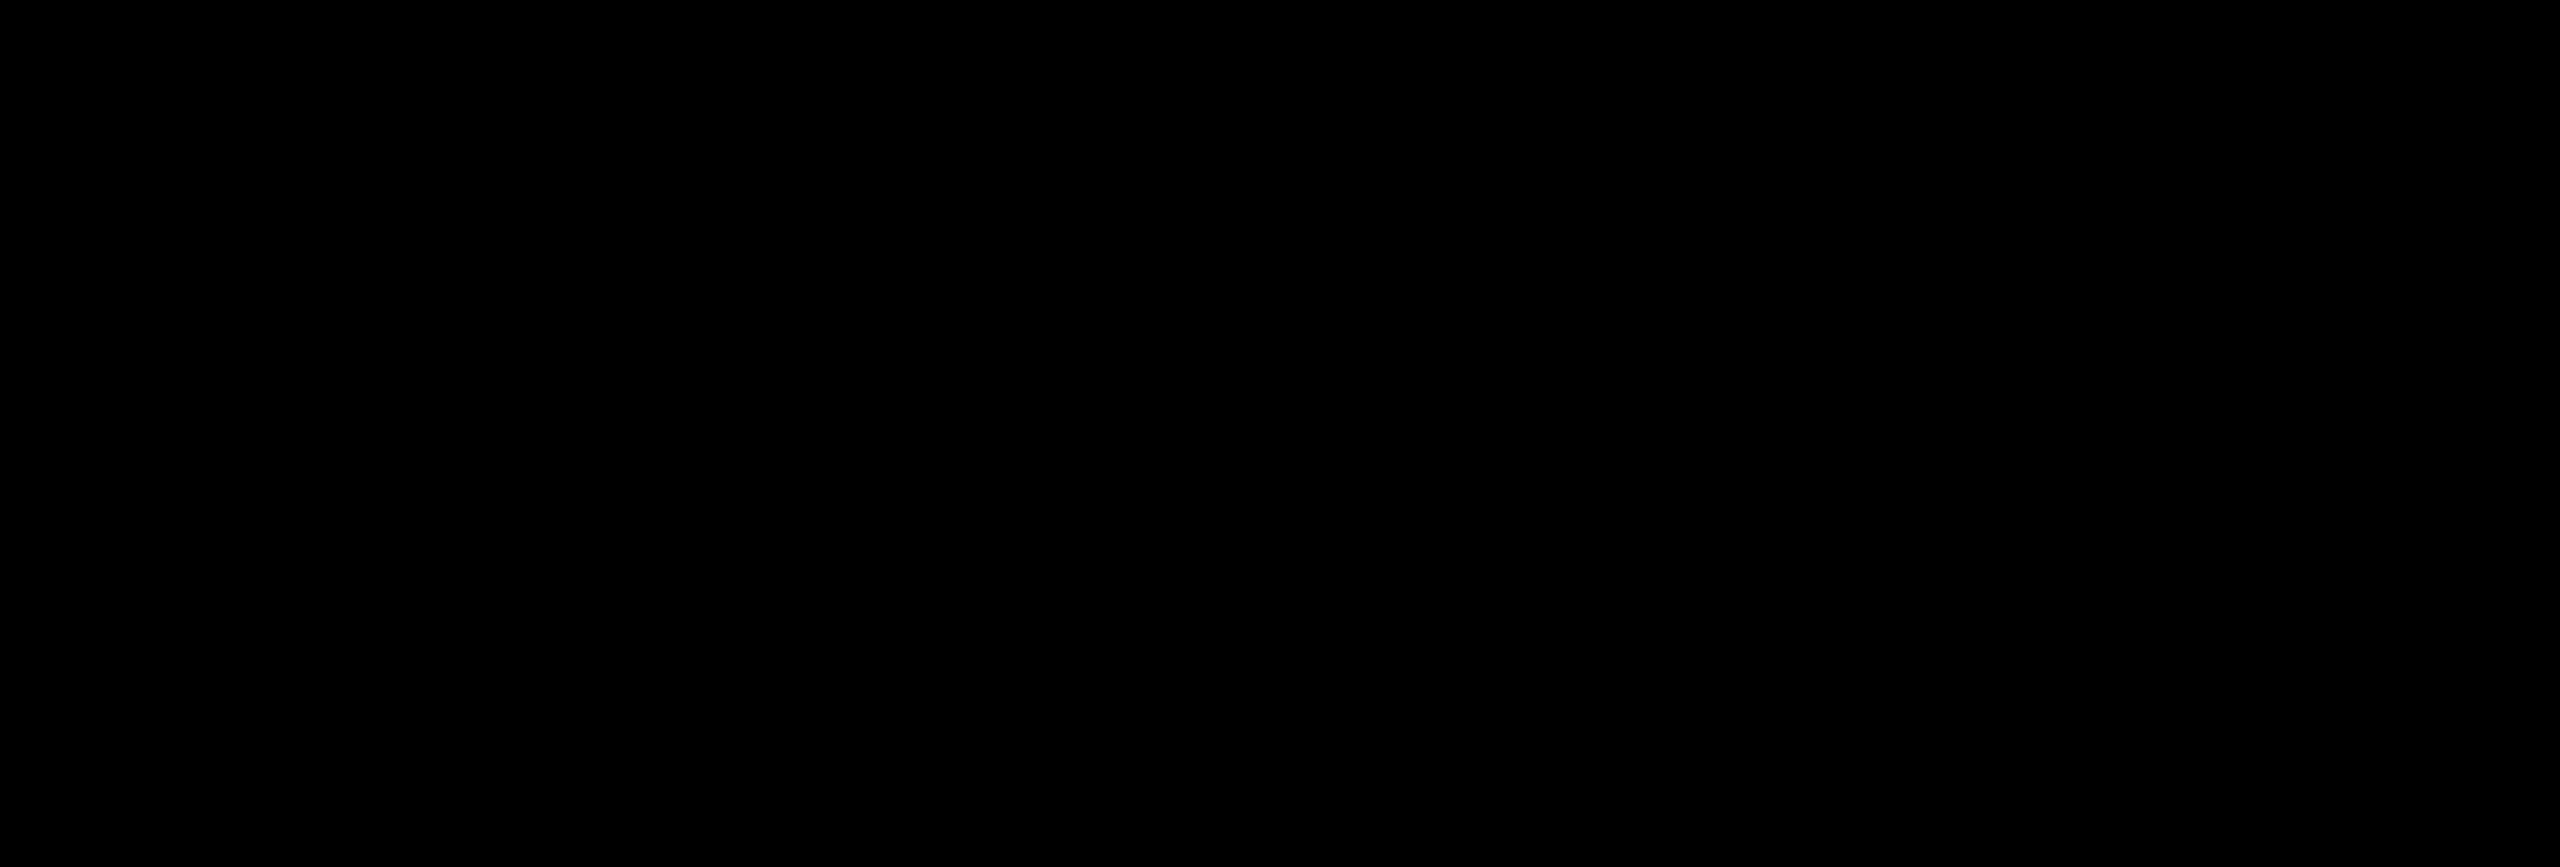 Ataturk Imza Logo Transparan Vektör Png